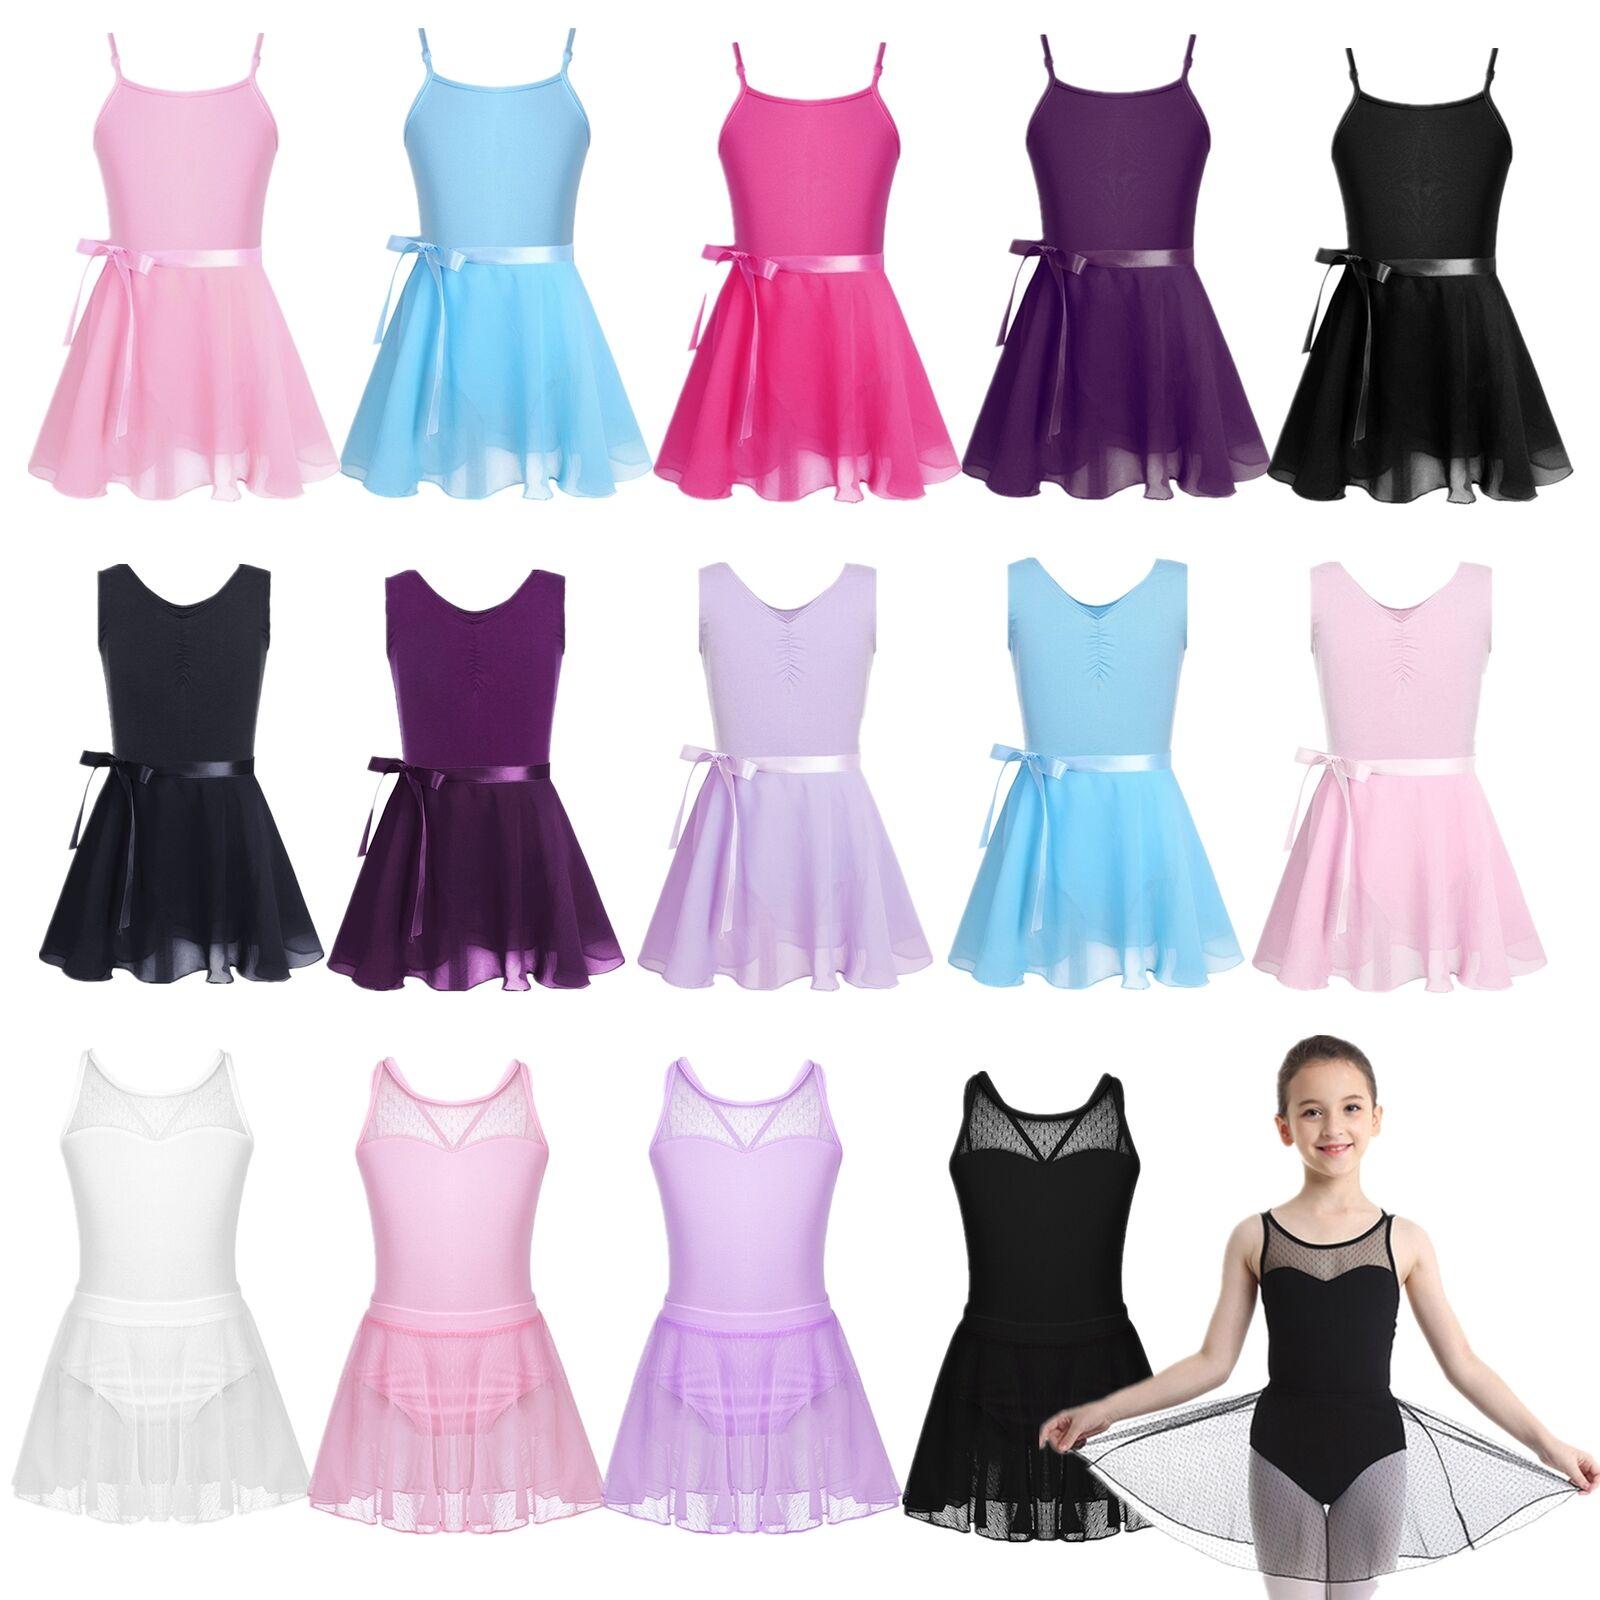 Girls Gymnastics Ballet Dance Wear Chiffon Sleeveless Outfit Set Show Costumes